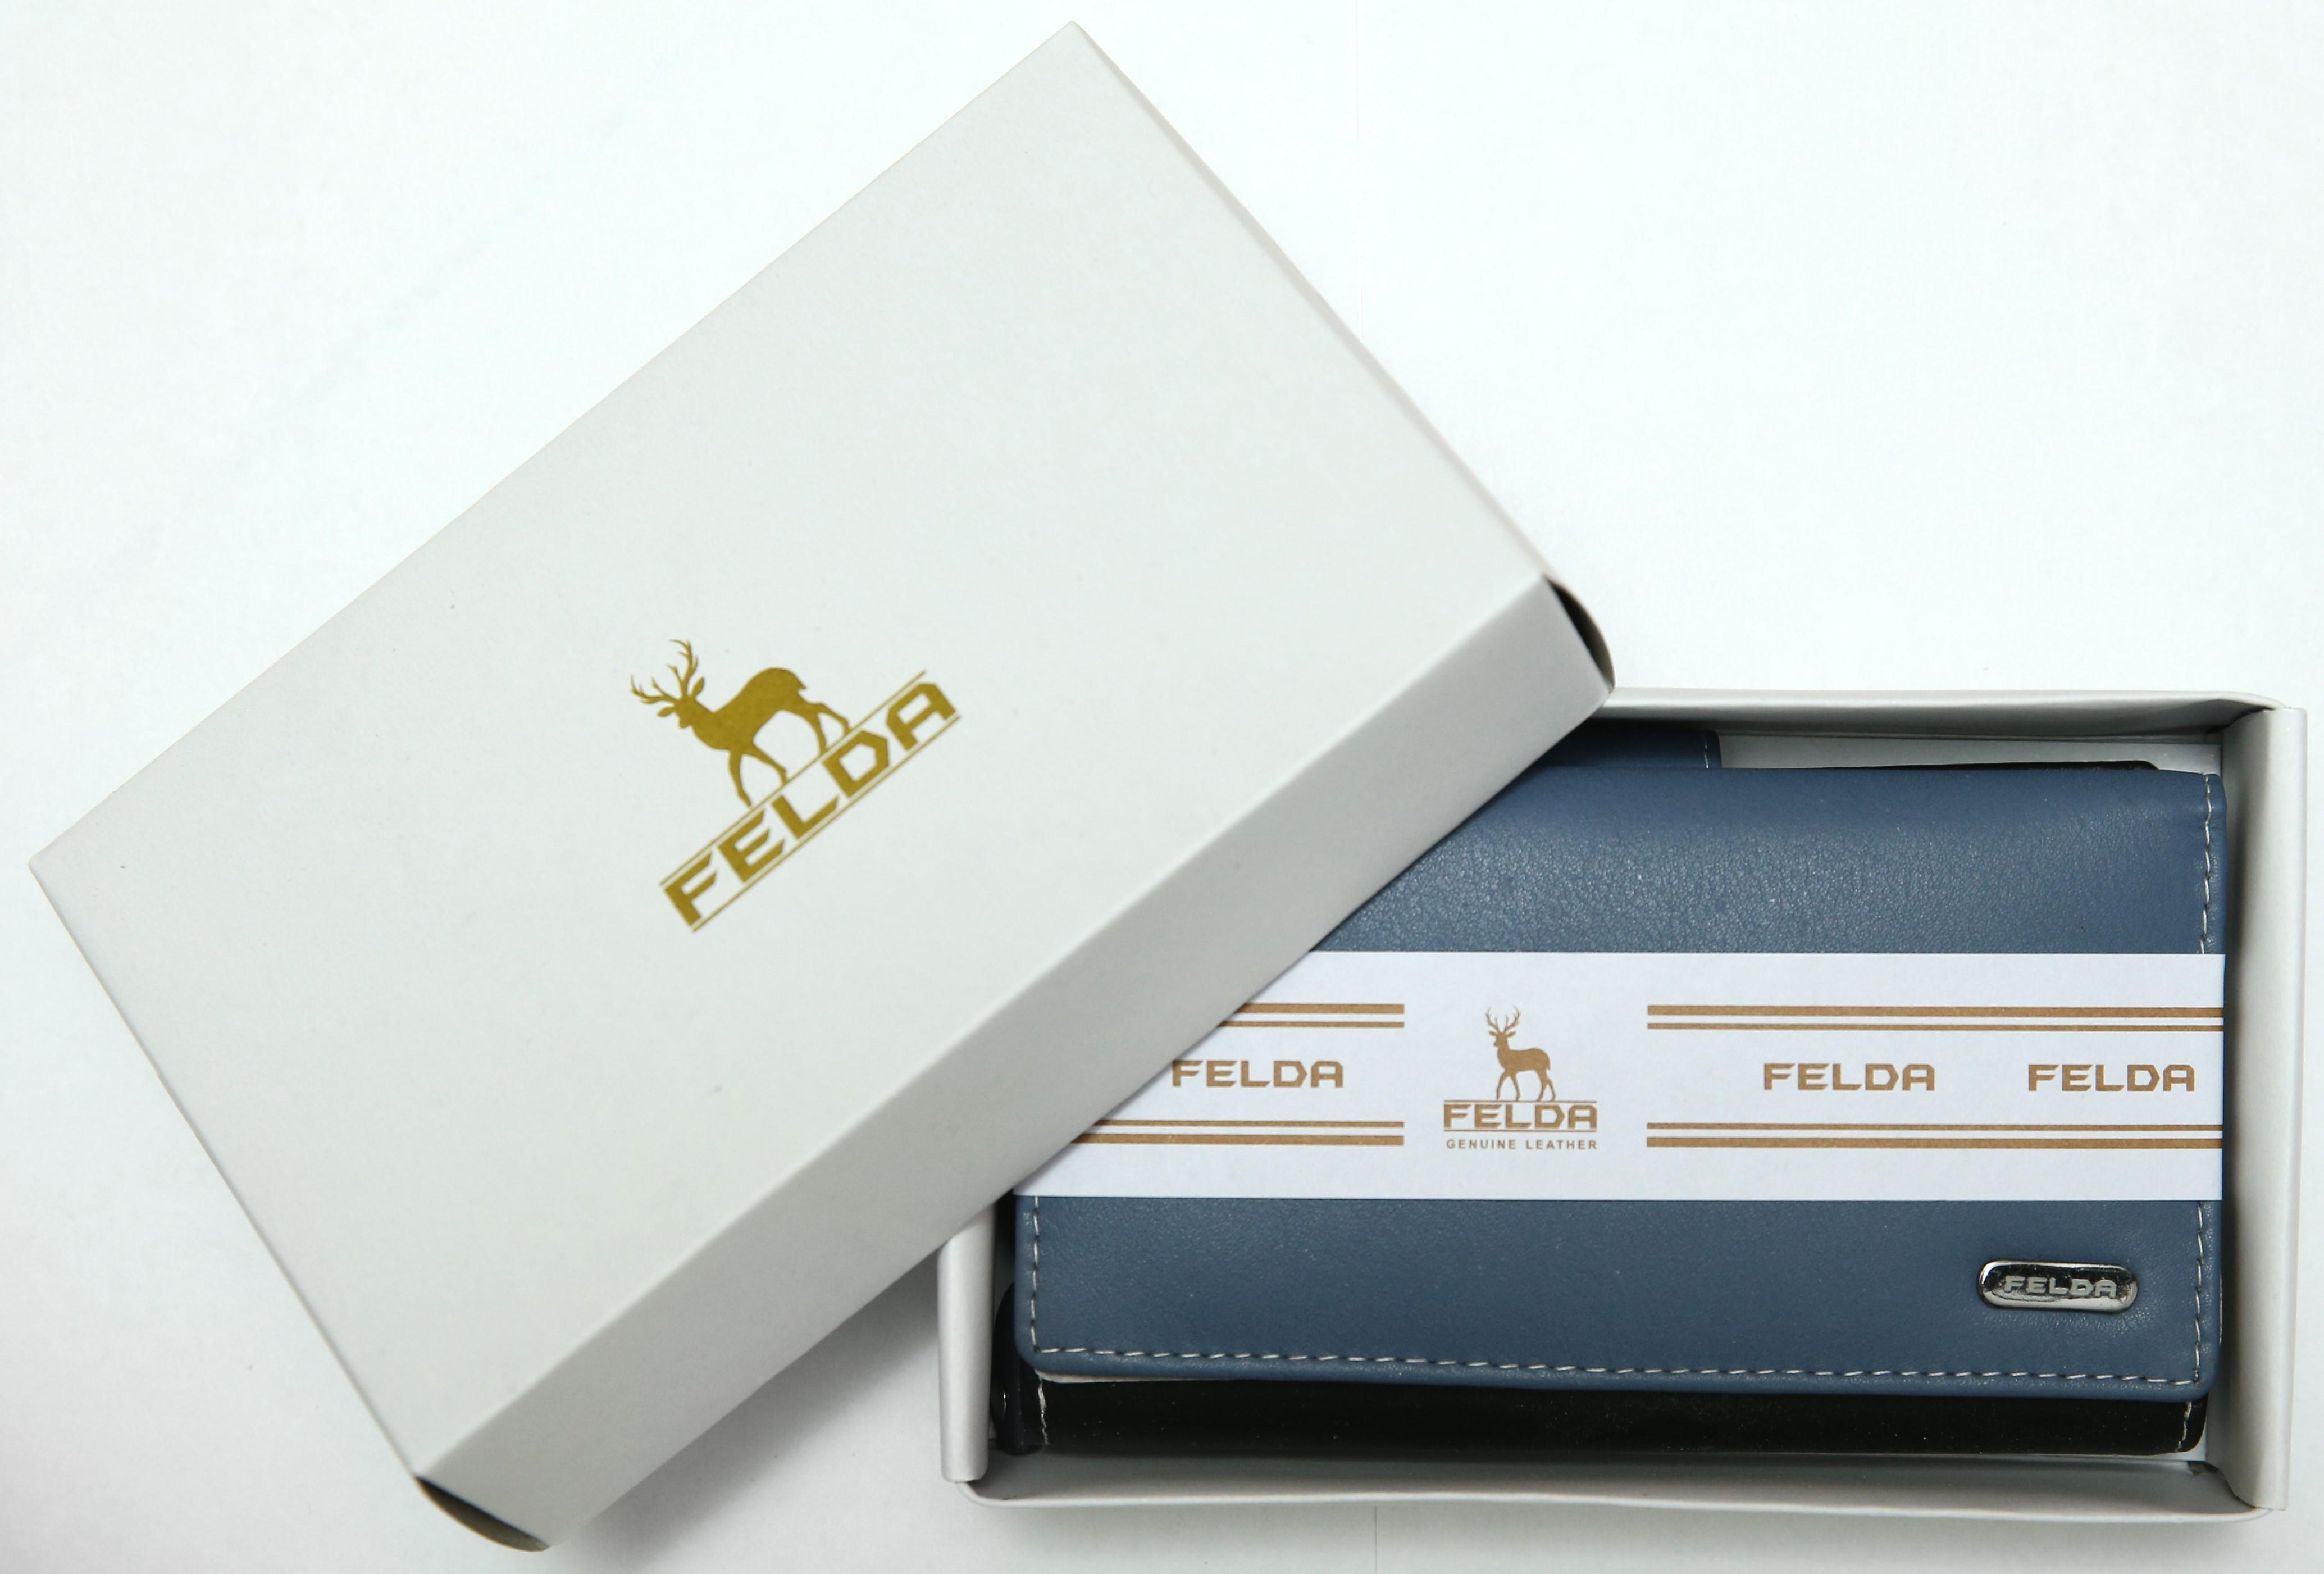 Felda-Portefeuille-pour-cartes-de-credit-cuir-souple-plusieurs-coloris miniature 28